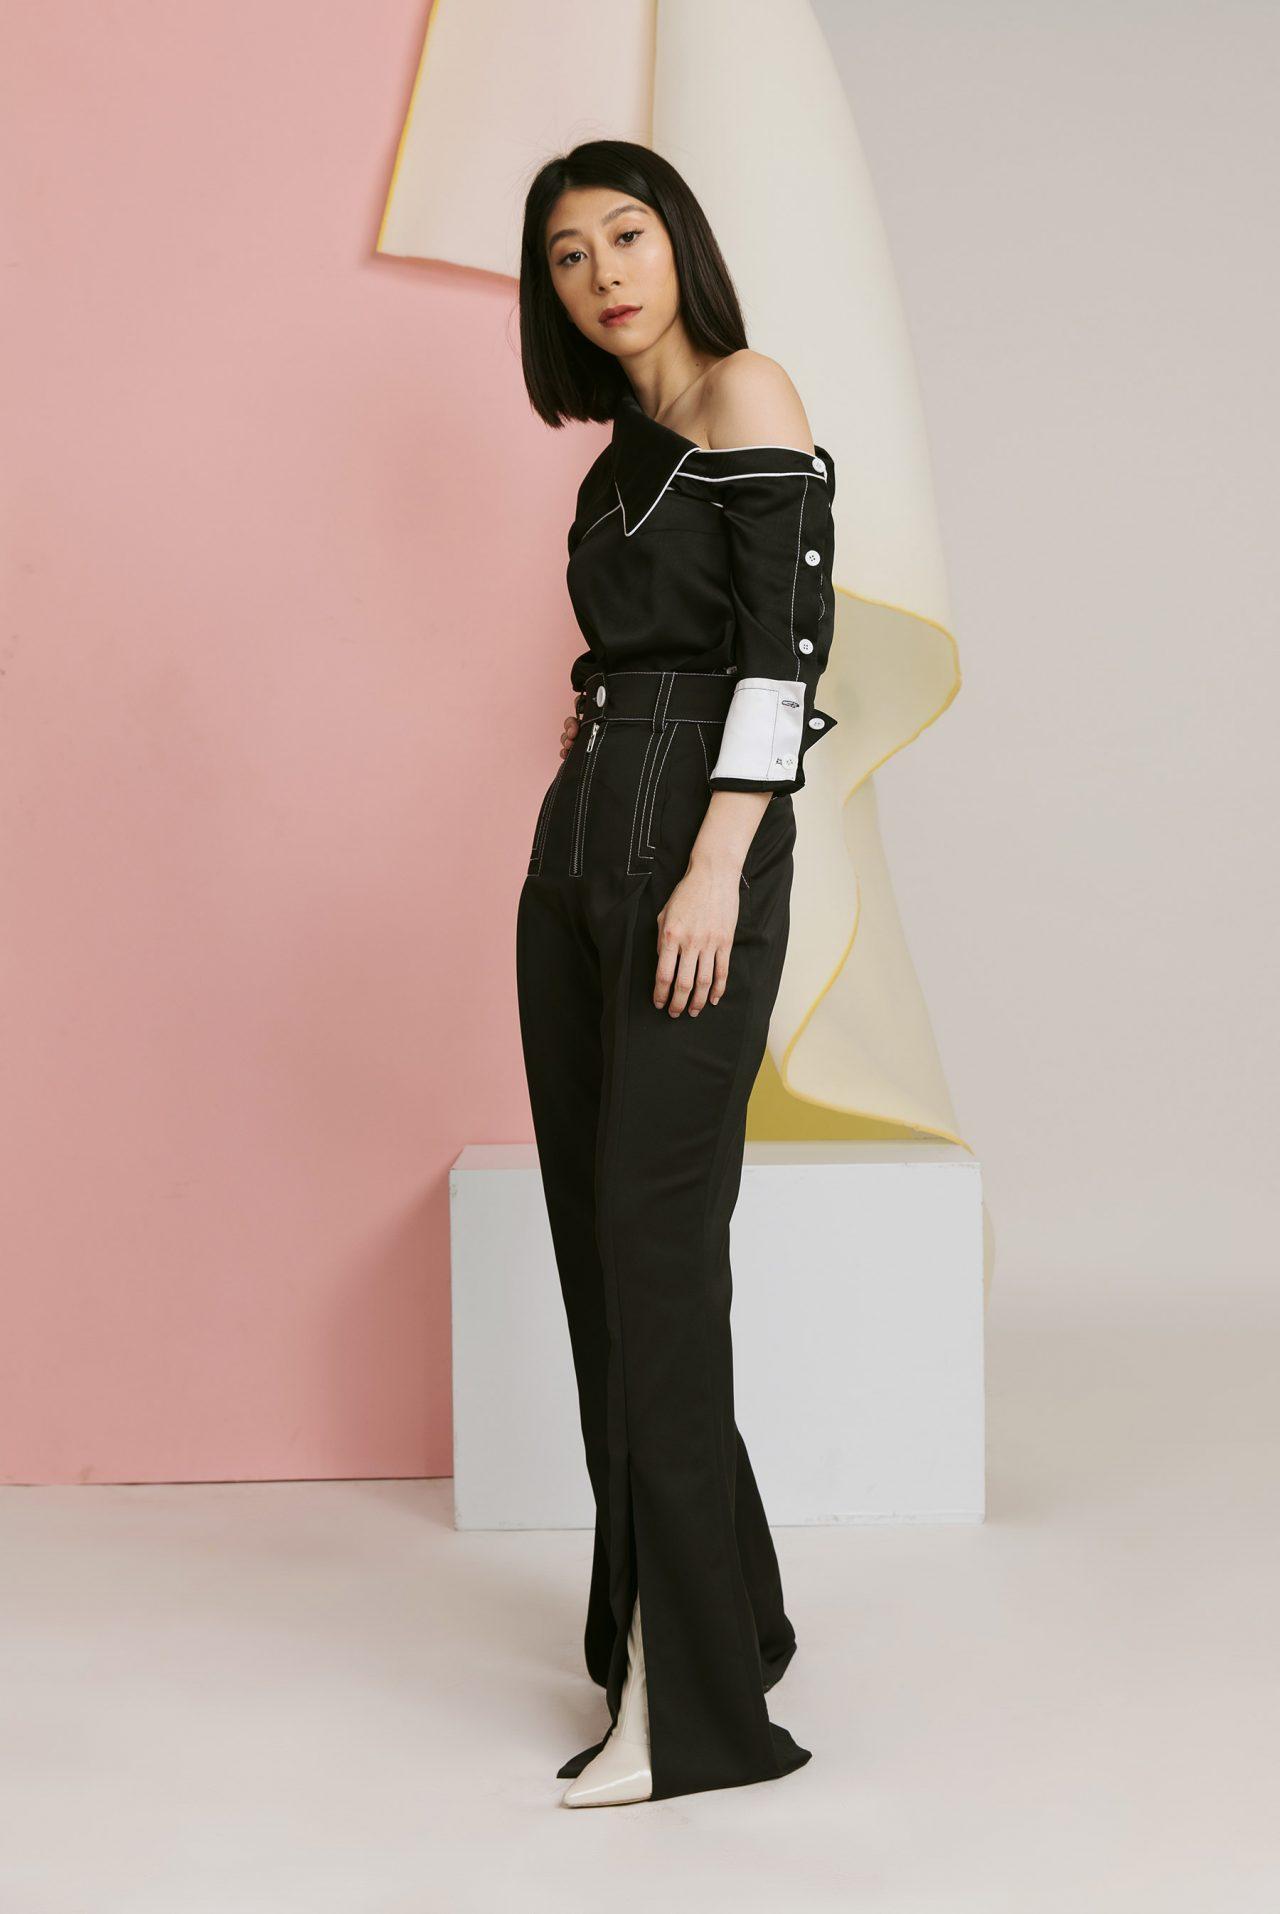 sjw-high-waist-pants-with-contrast-stitching-5